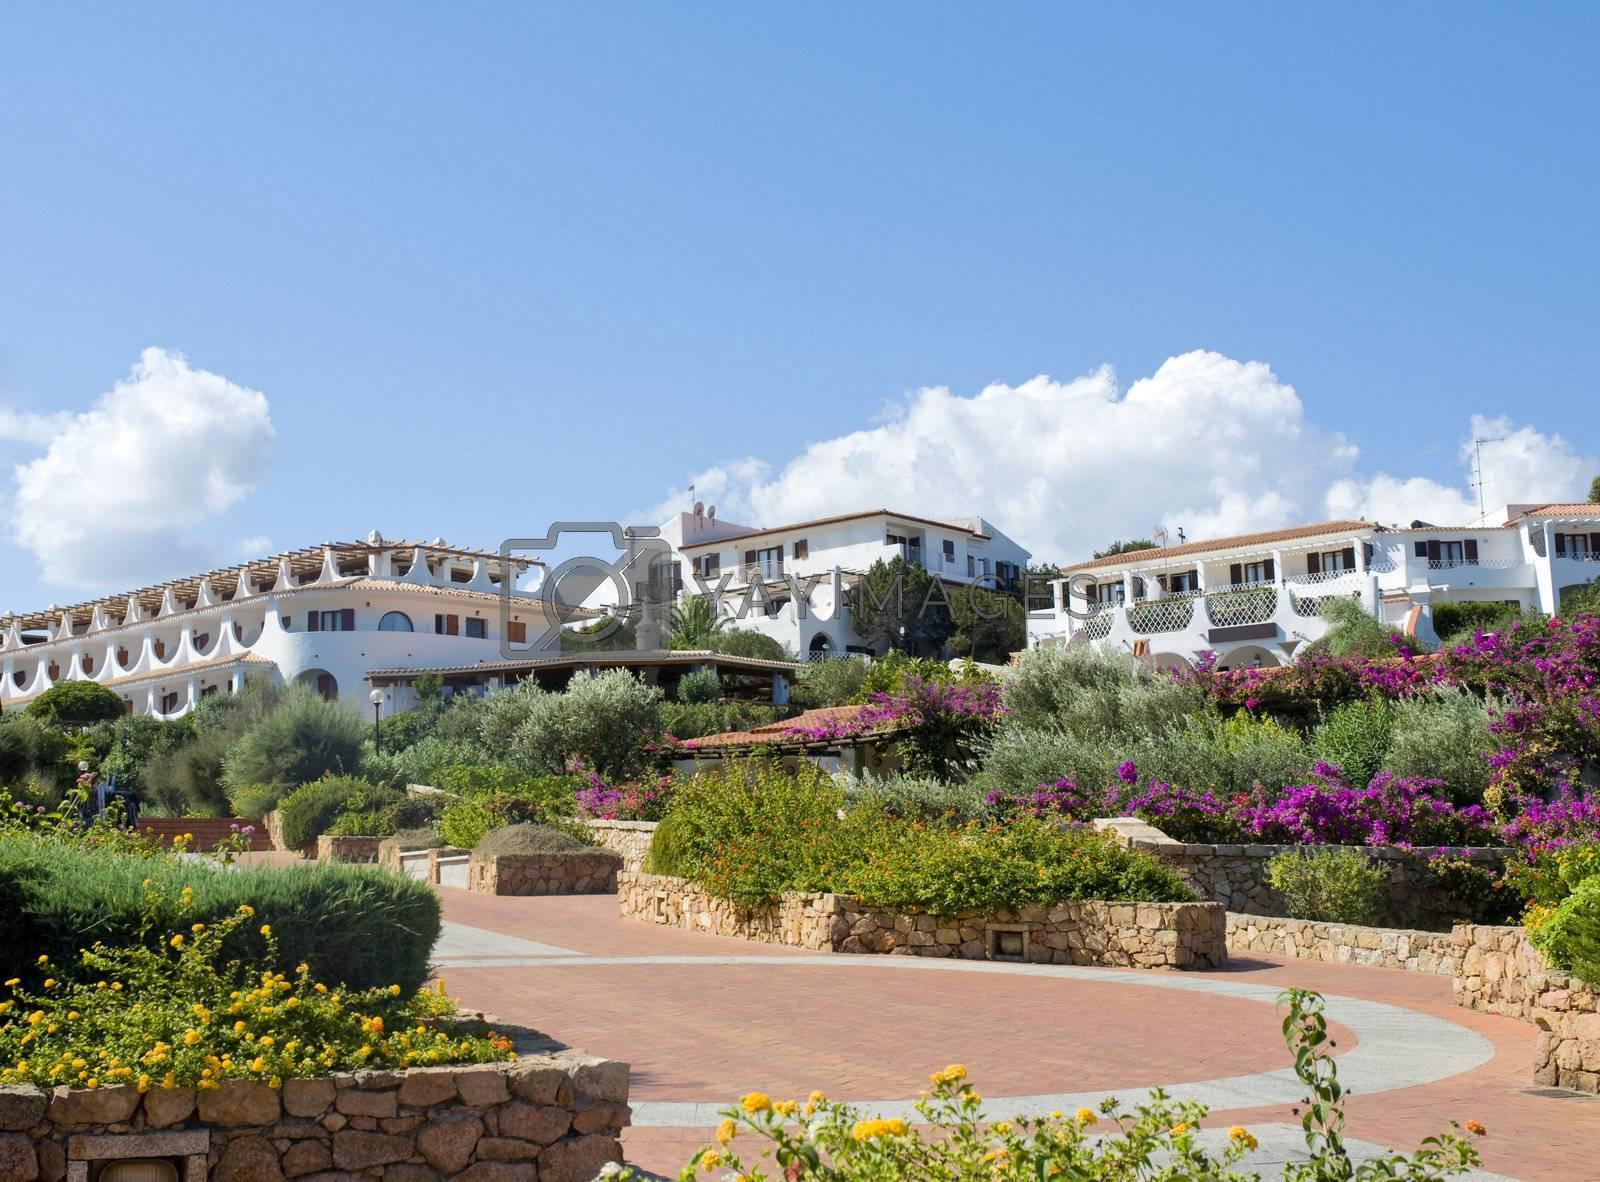 Royalty free image of Baia Sardinia by carla720